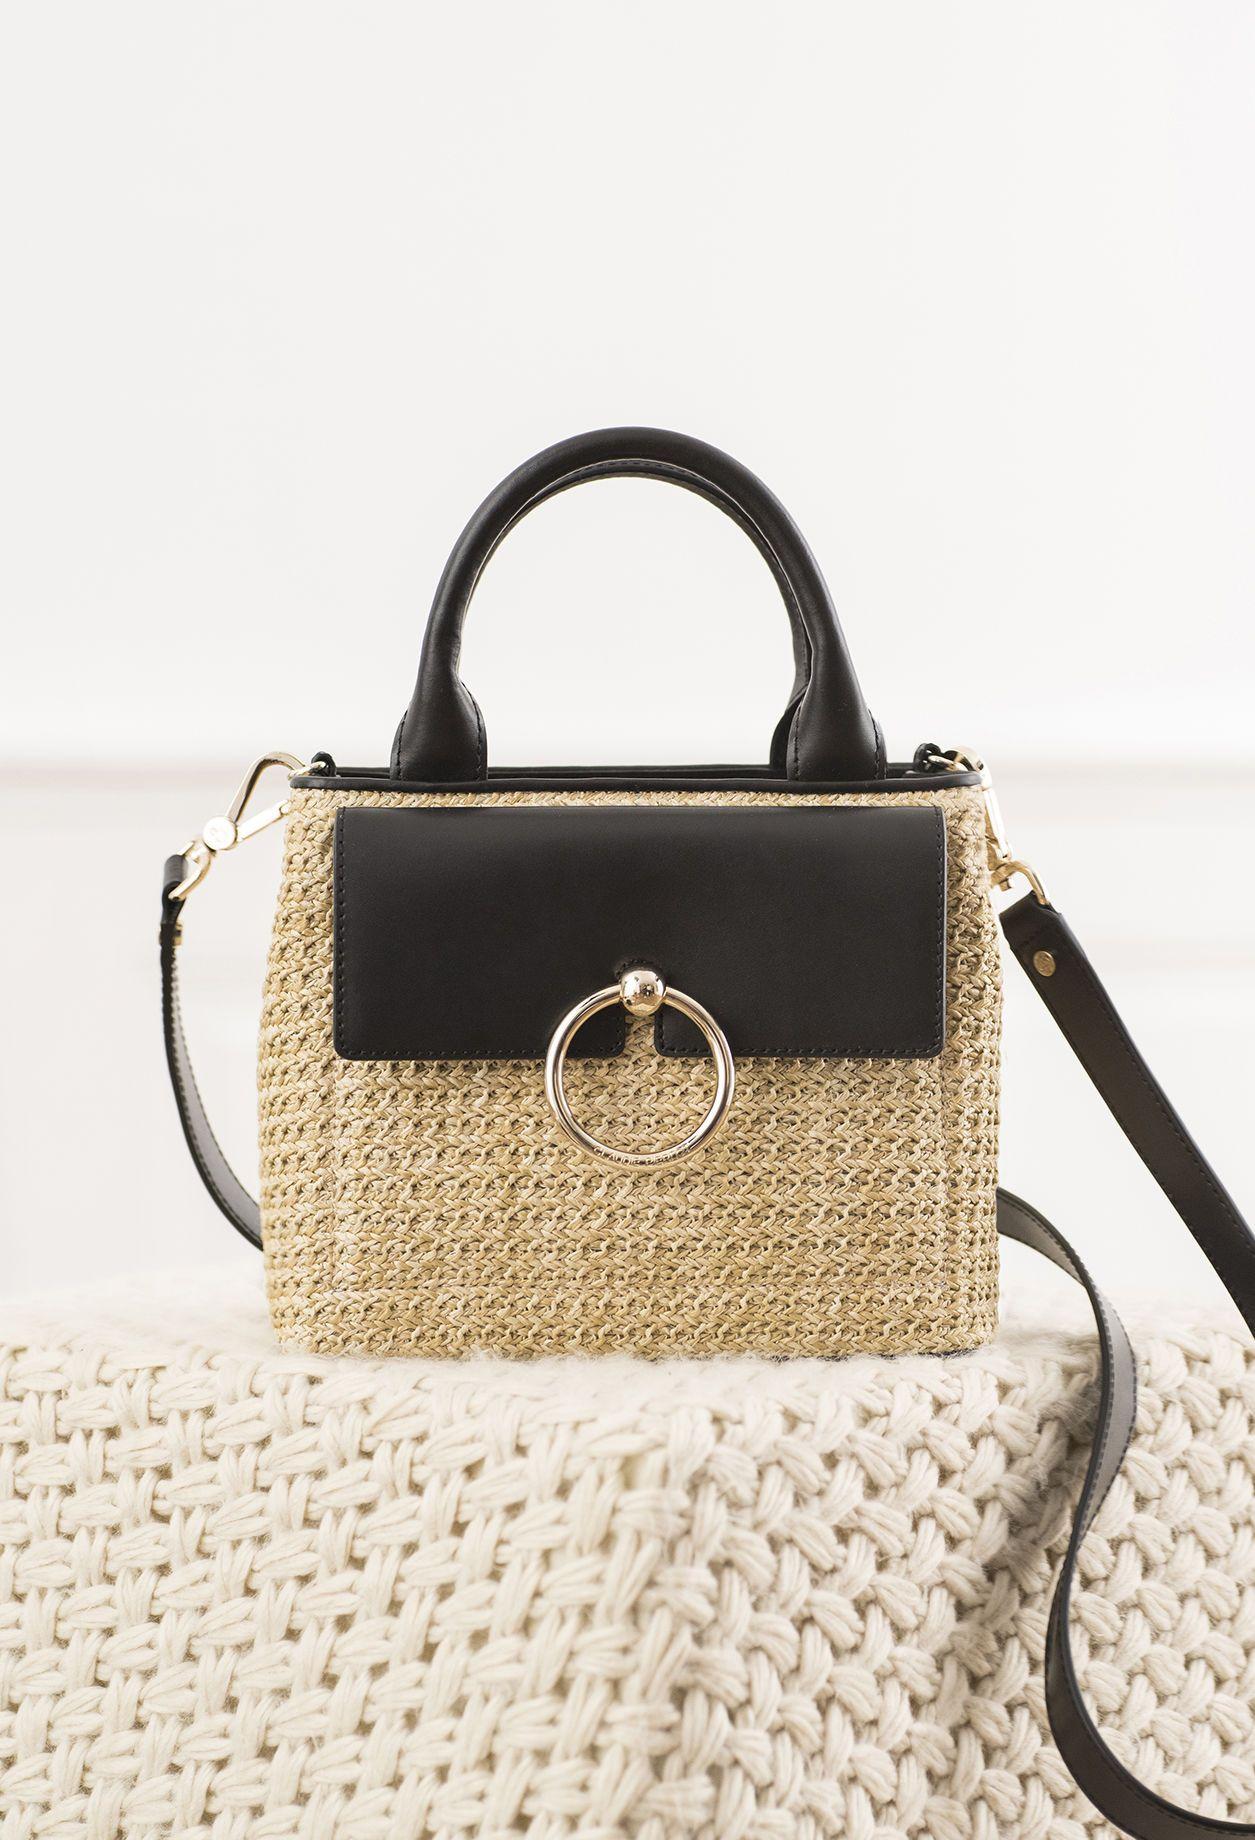 42eb34e5c2 ANOUCK SMALL TRESSE - Accessoires - Claudie Pierlot | Fashion | Sac ...